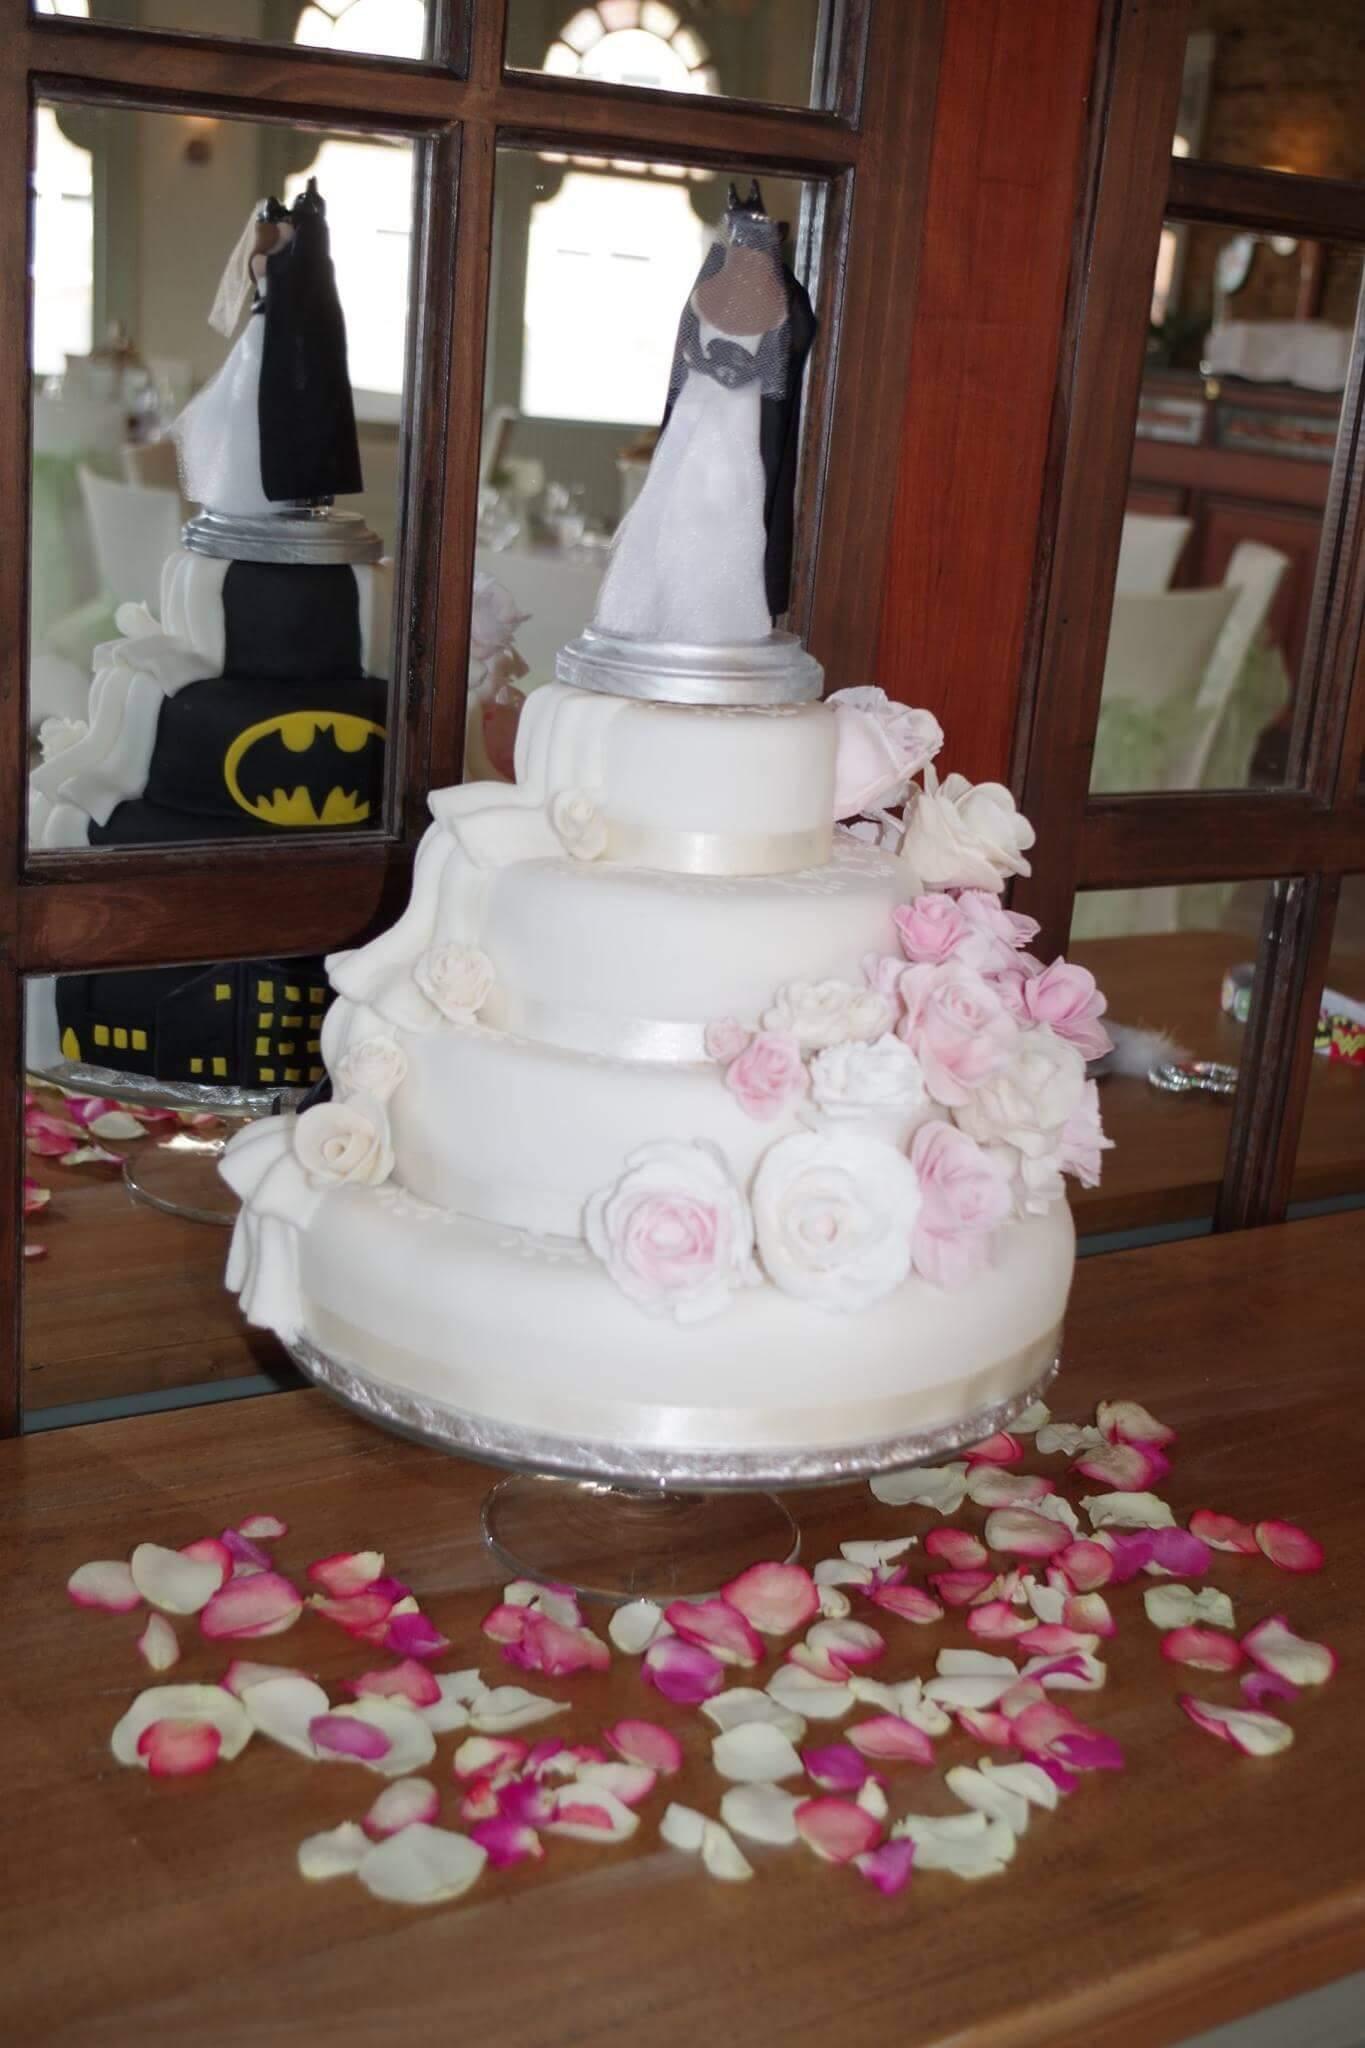 How to Choose a Unique Wedding Theme